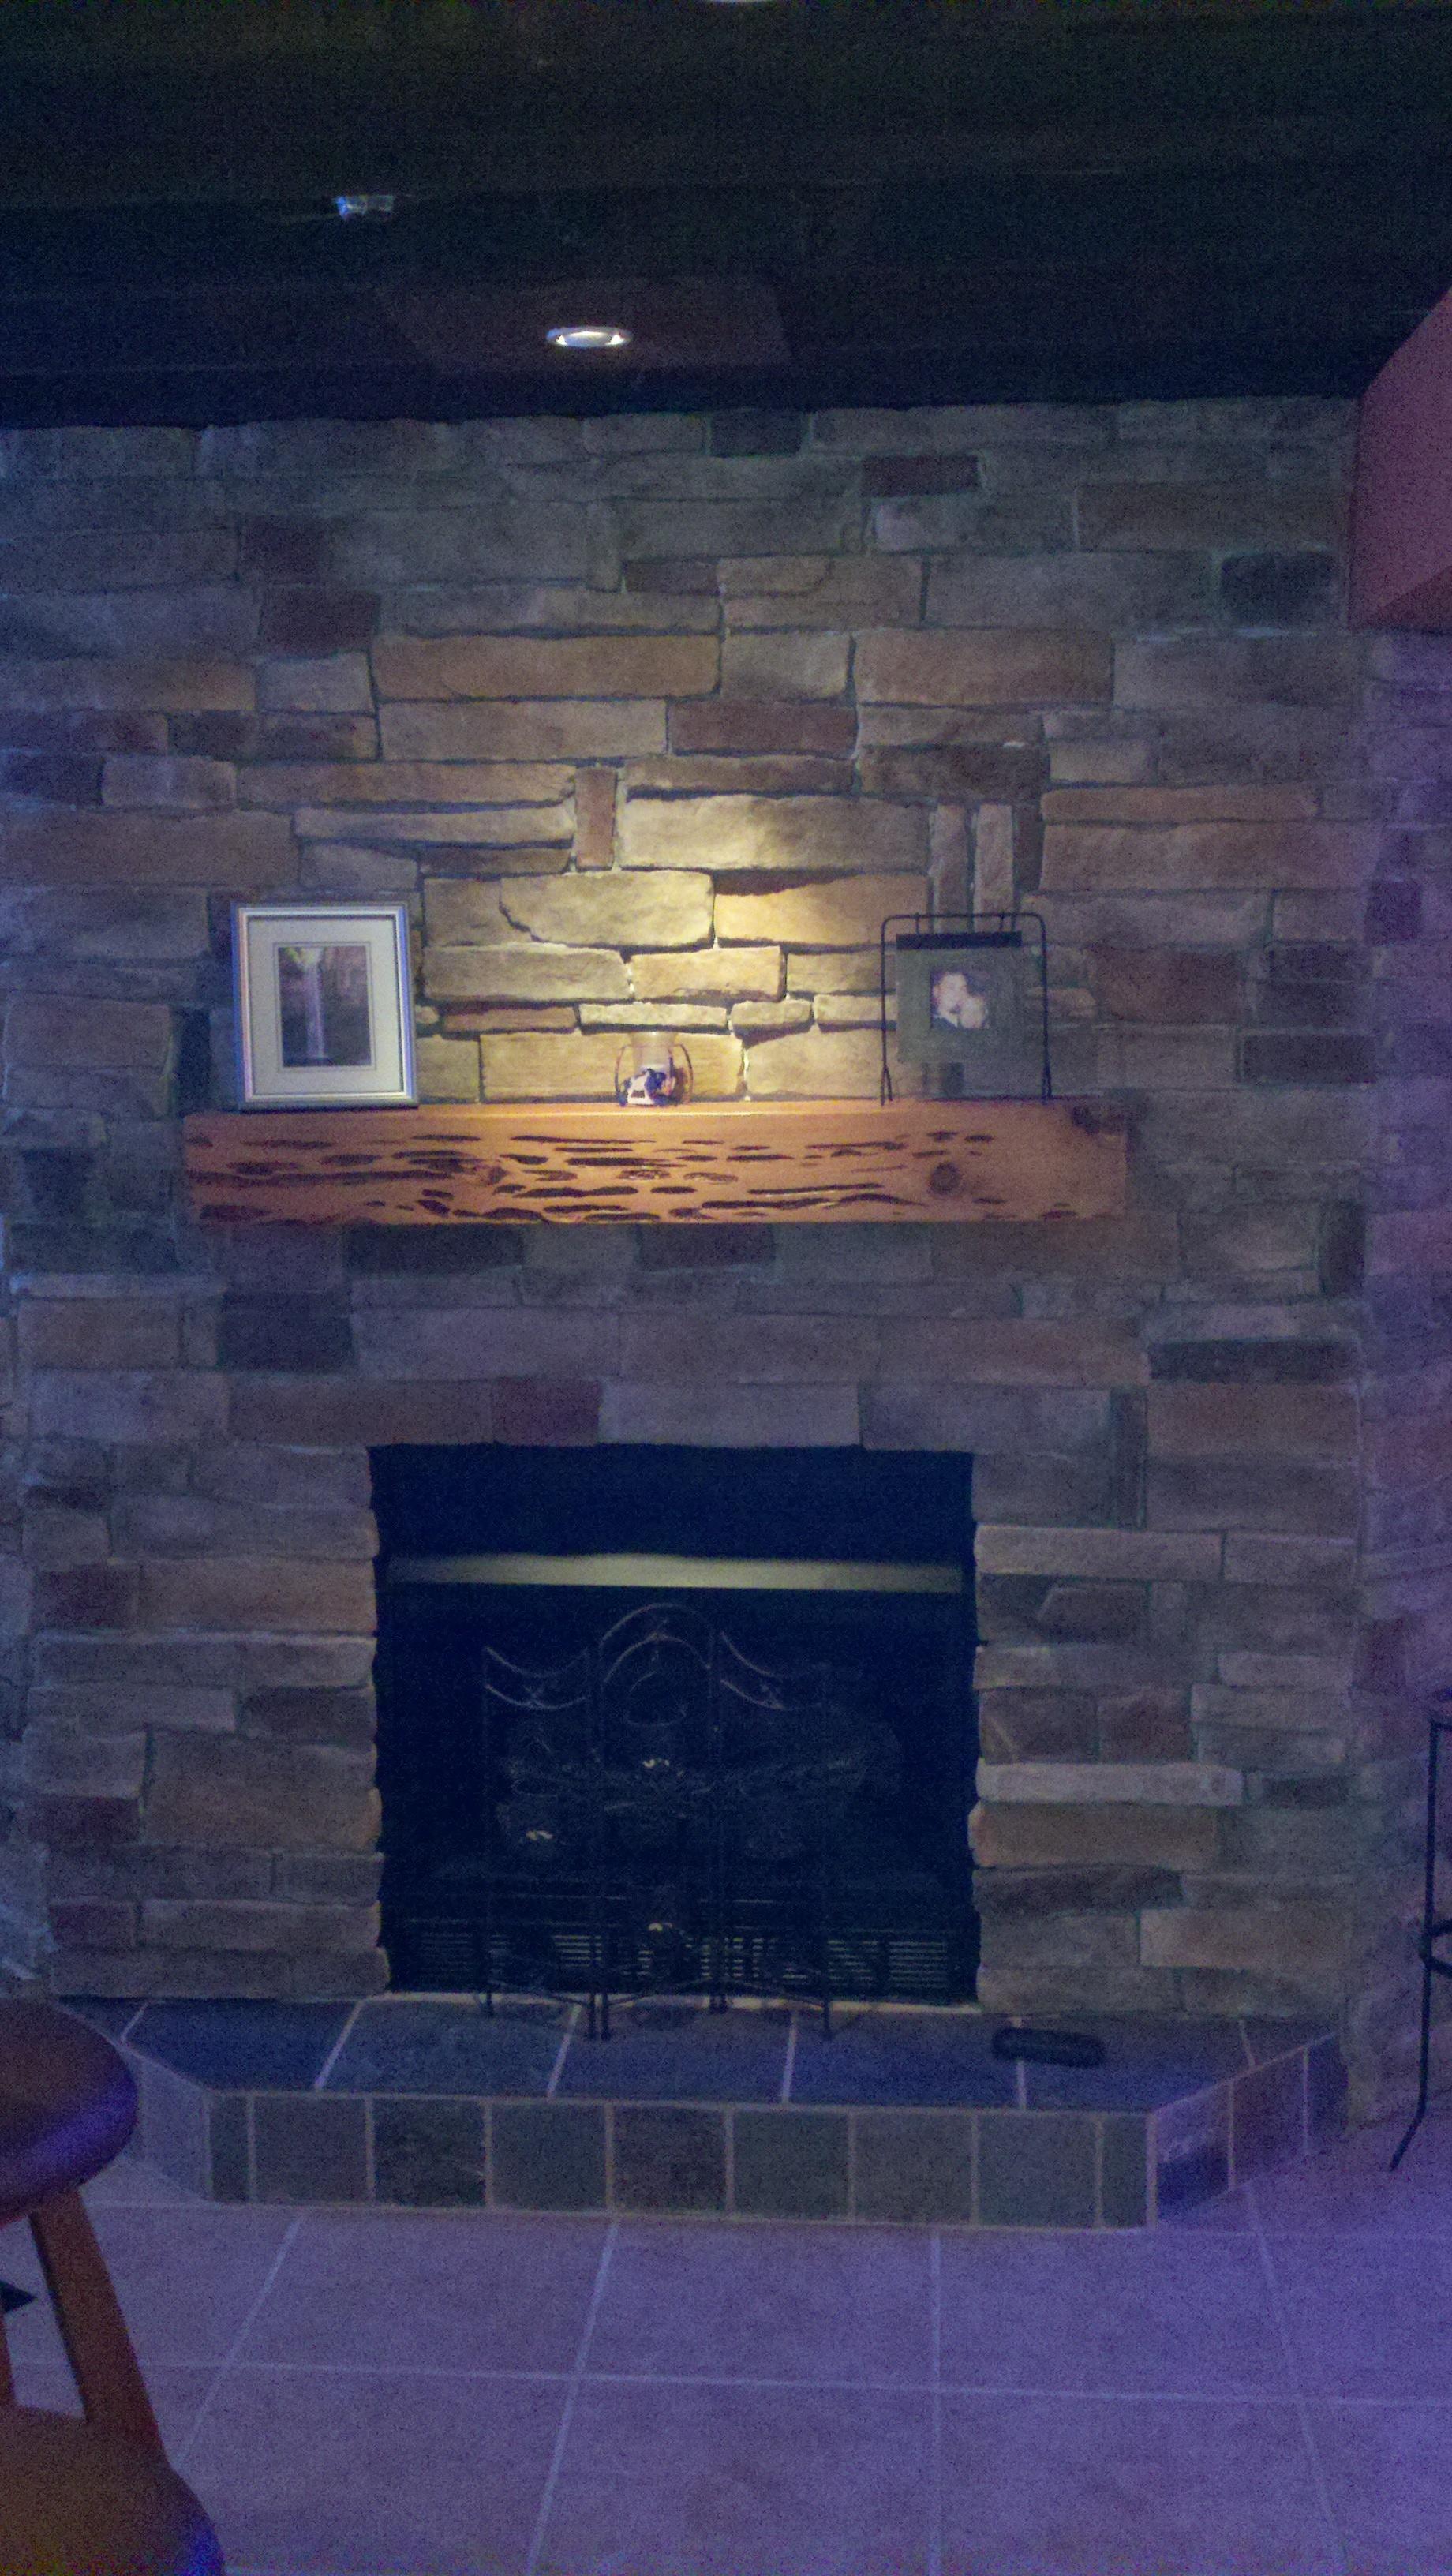 Summerside Fireplace stone work